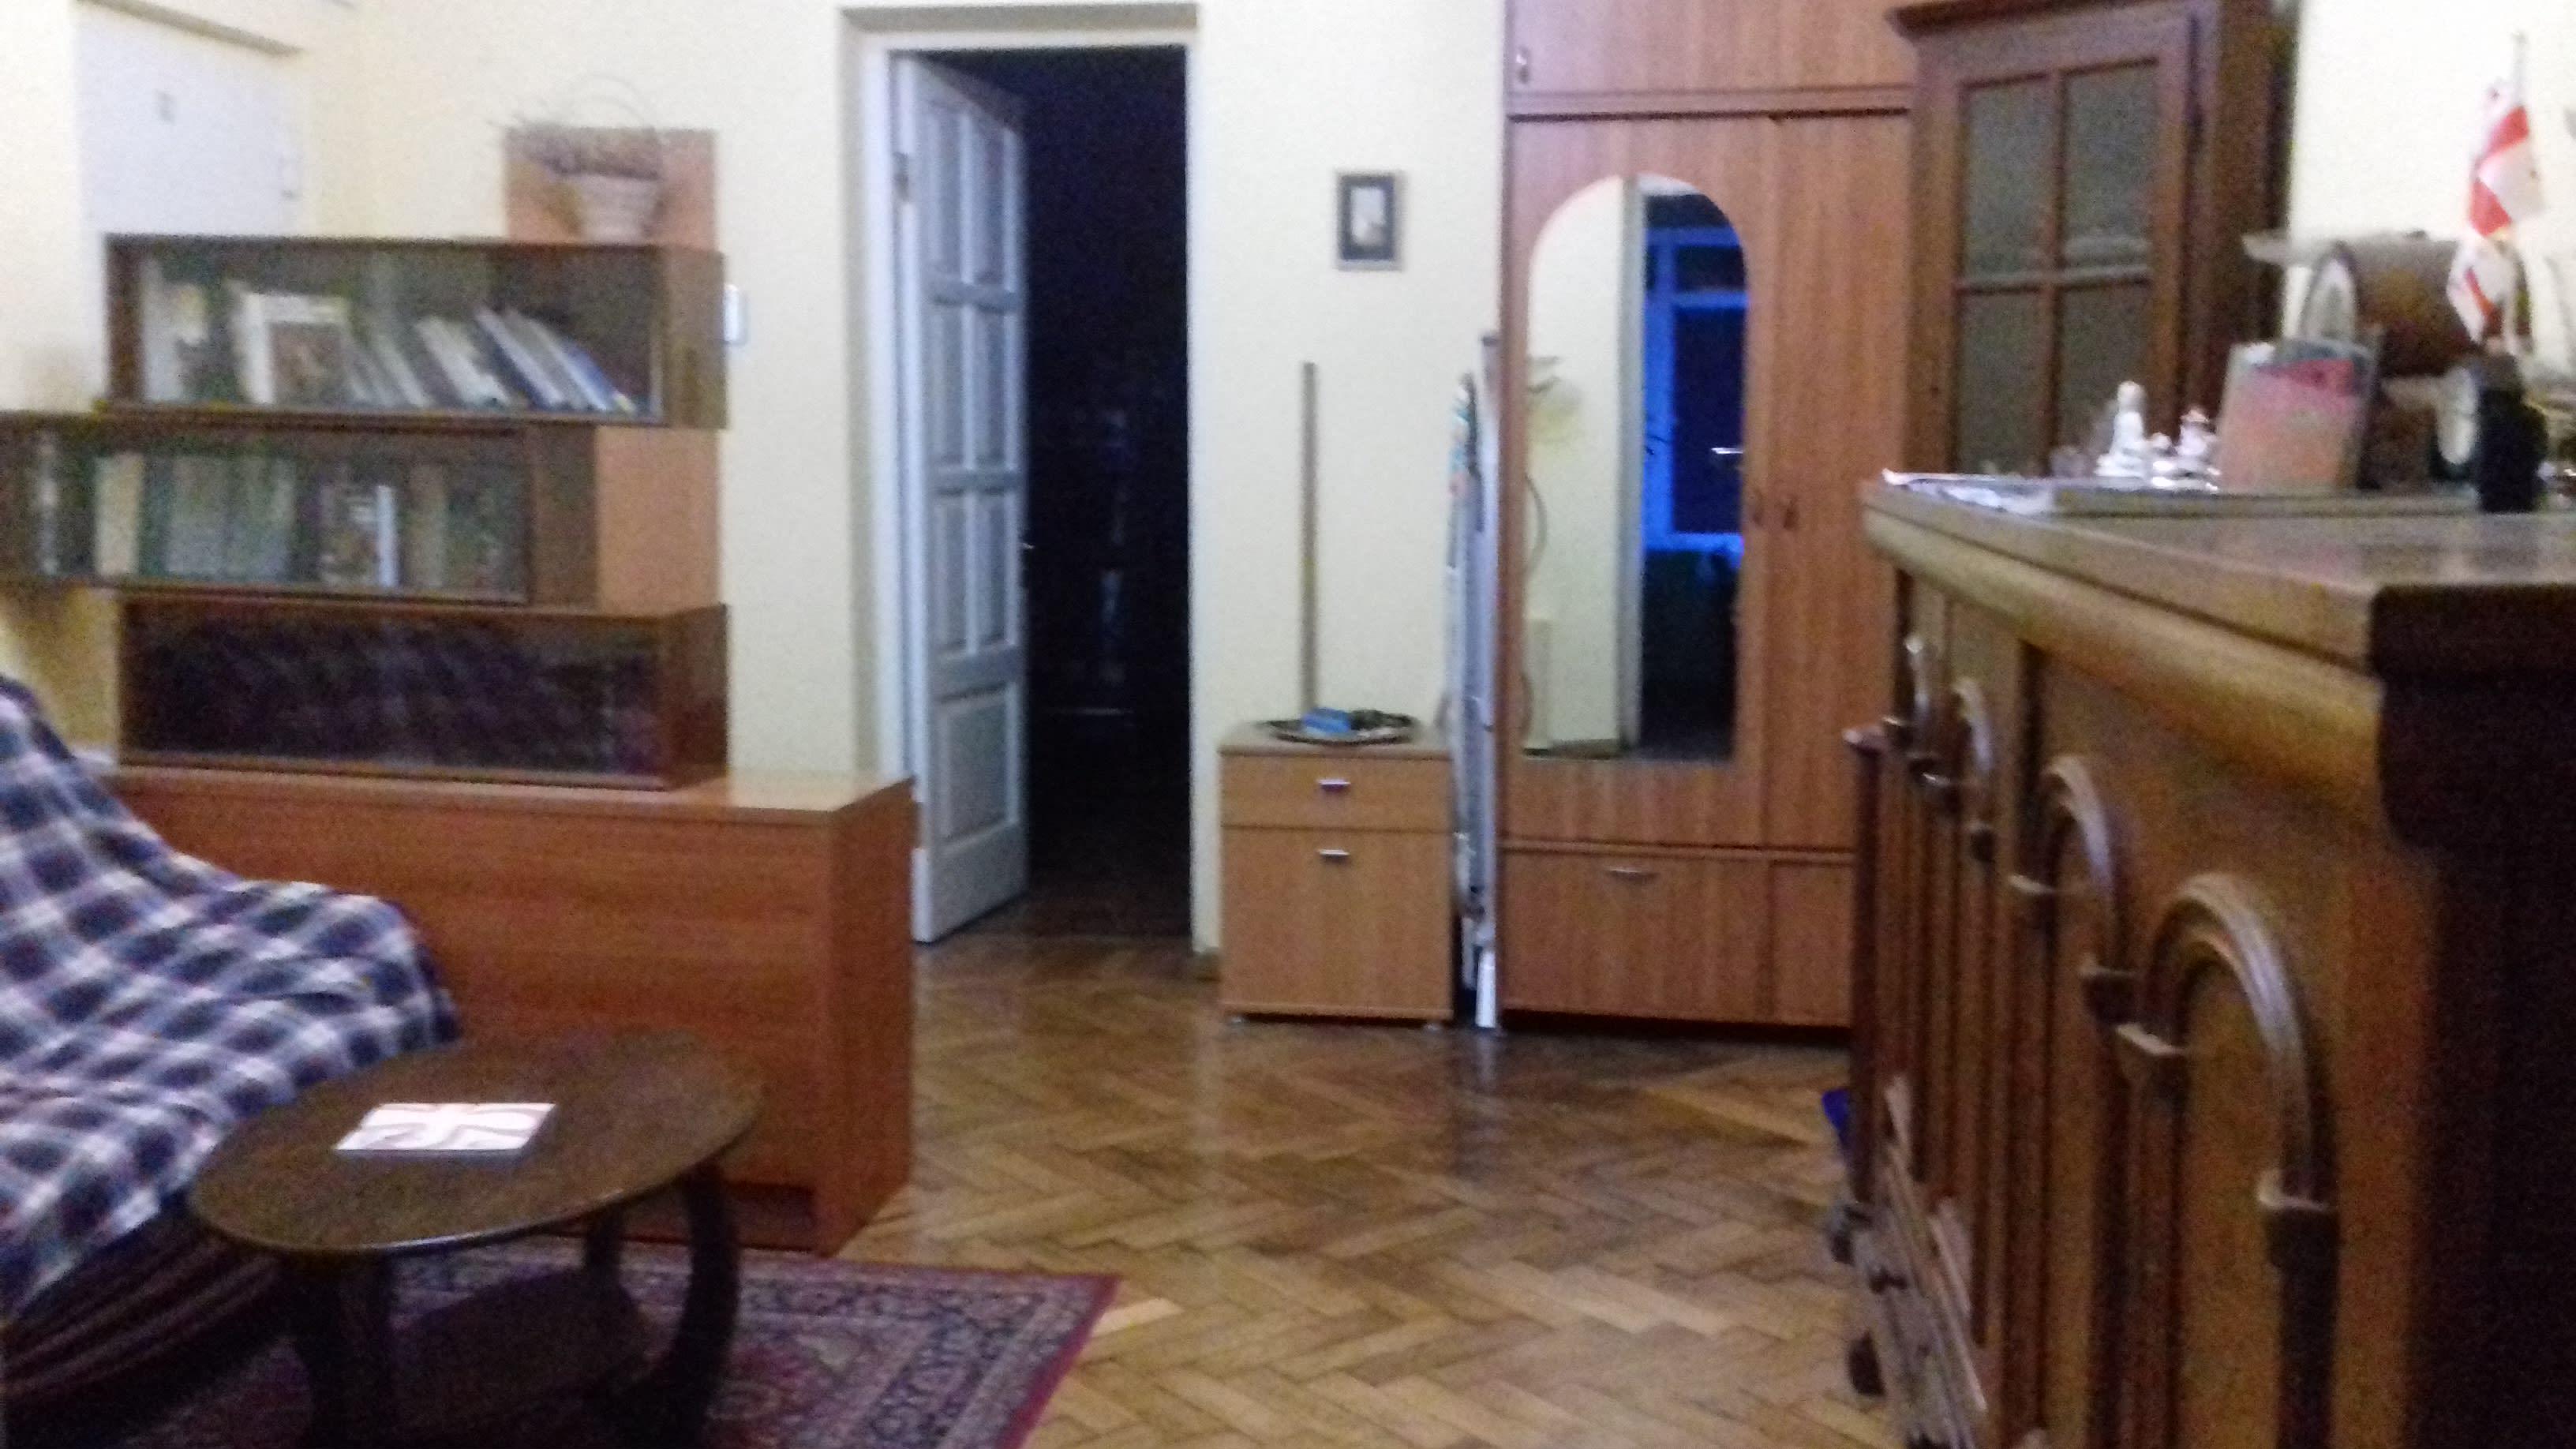 HOSTEL - BHM Rooms Hostel